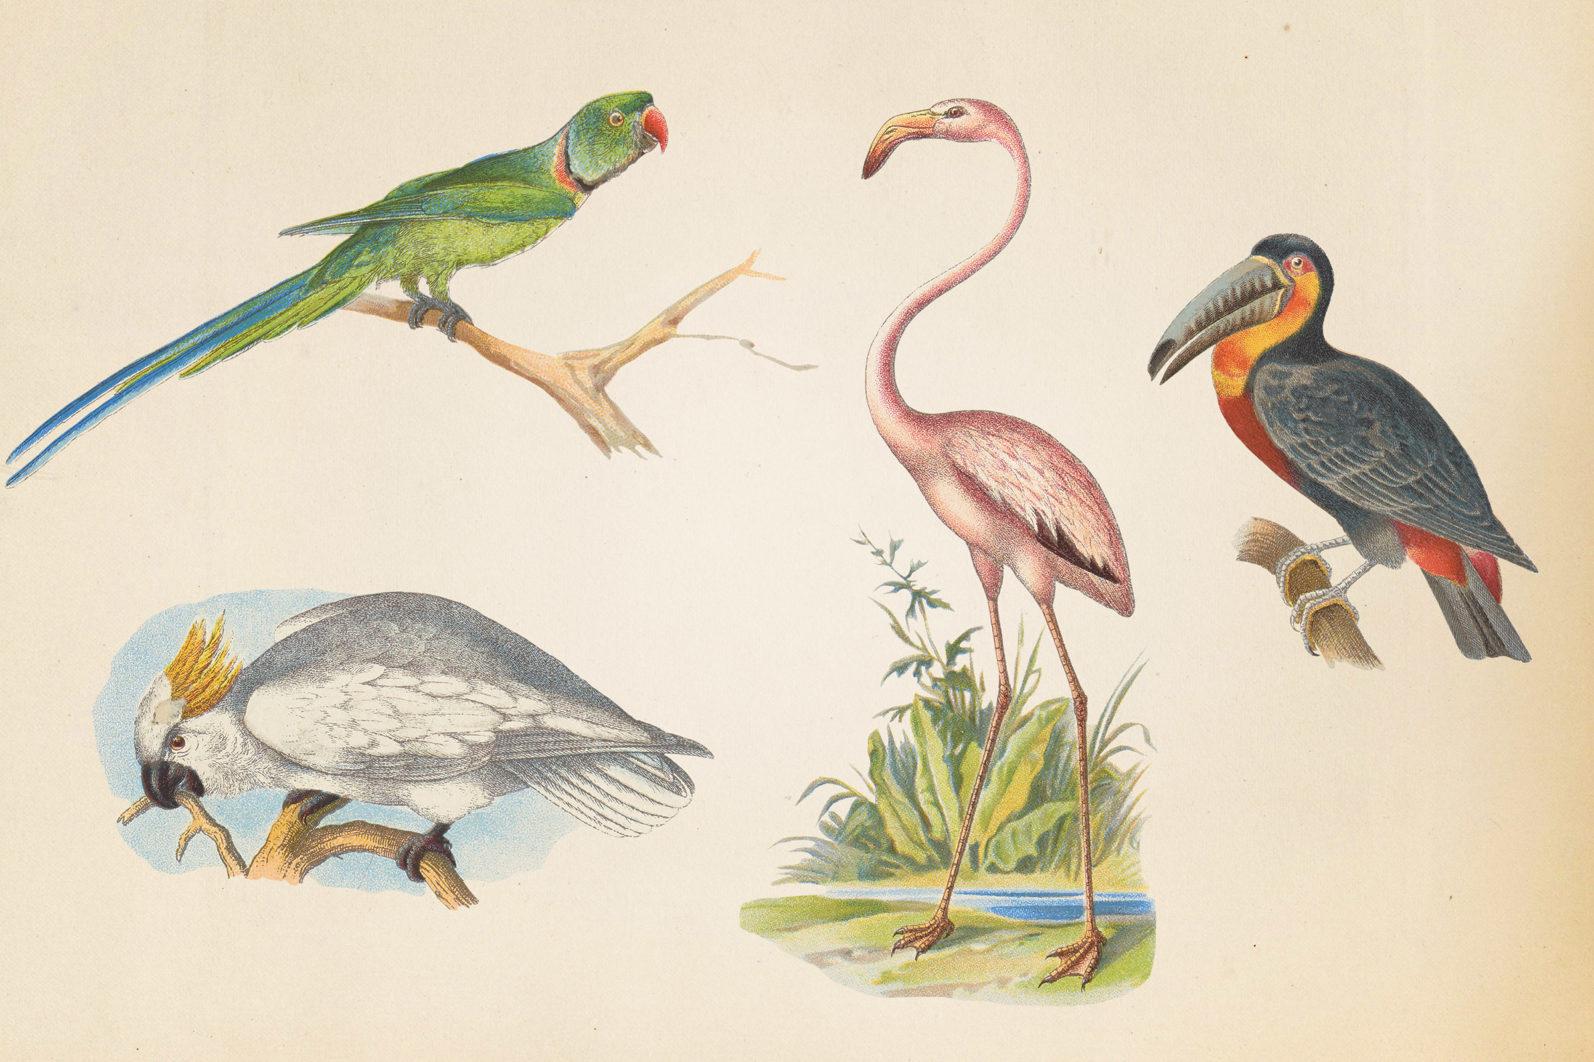 Vintage Exotic Birds - mock 3 3 -